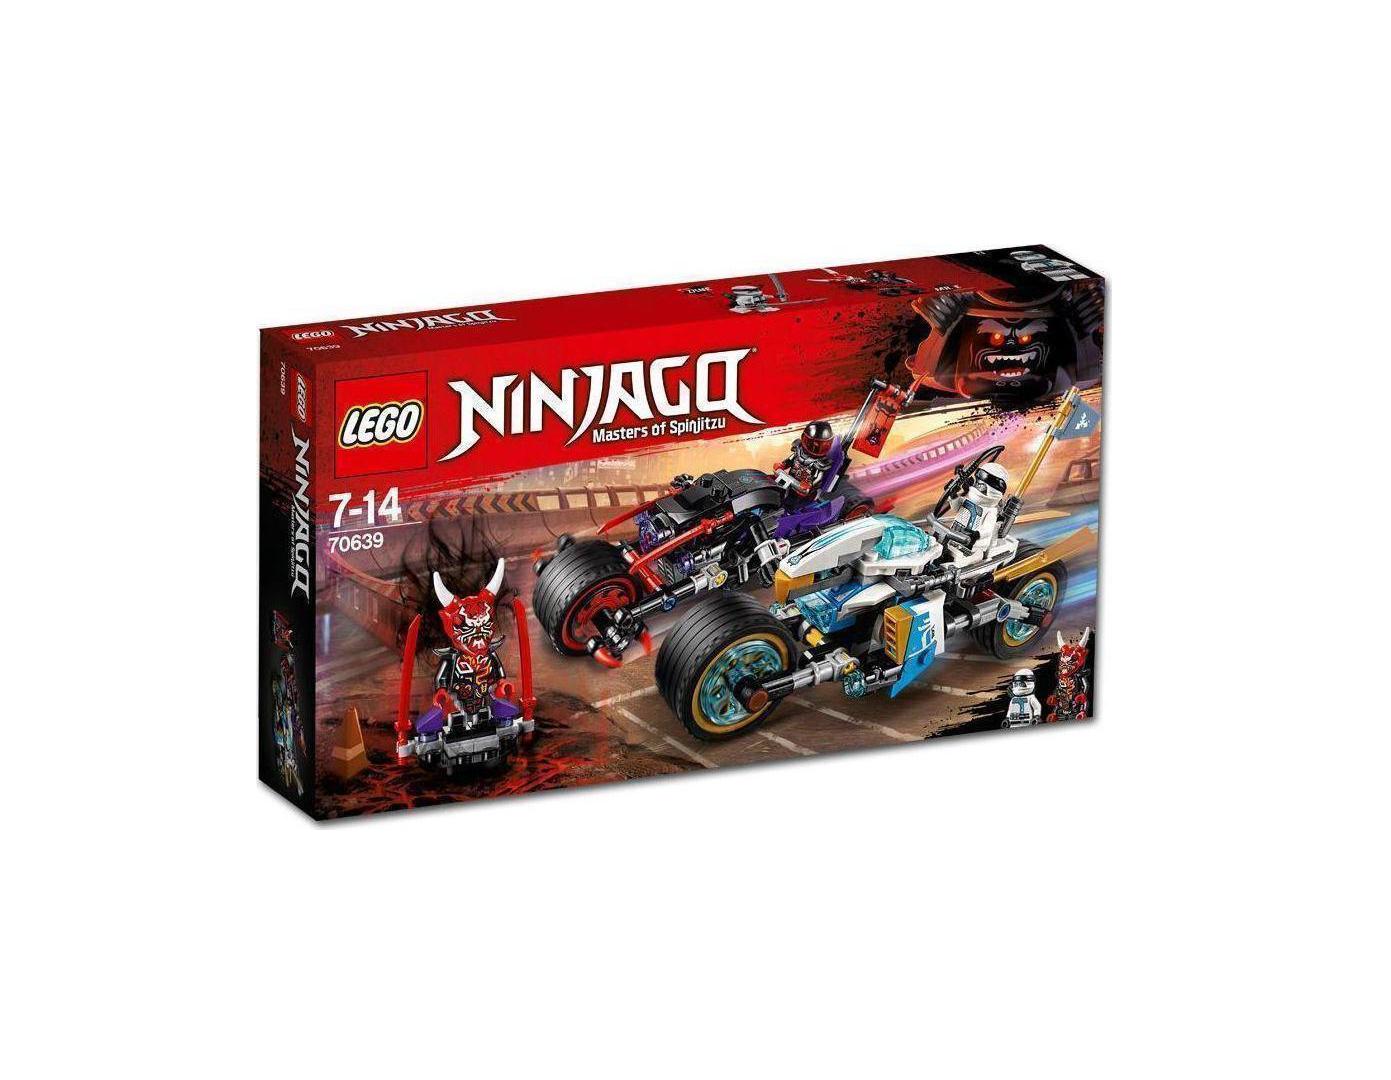 Lego Ninjago: Street Race of Snake Jaguar 70639